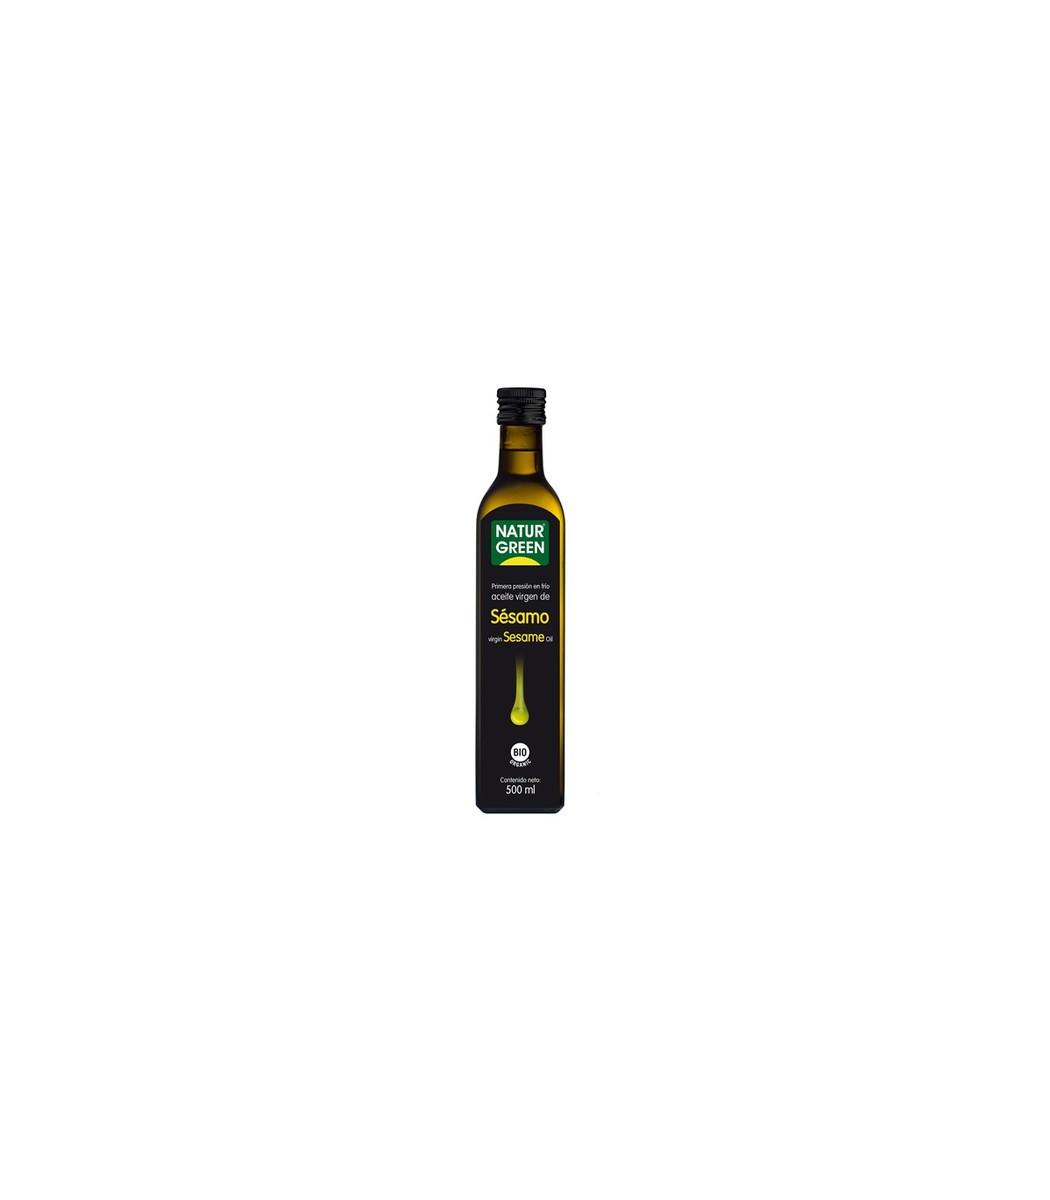 Aceite de sésamo Naturgreen